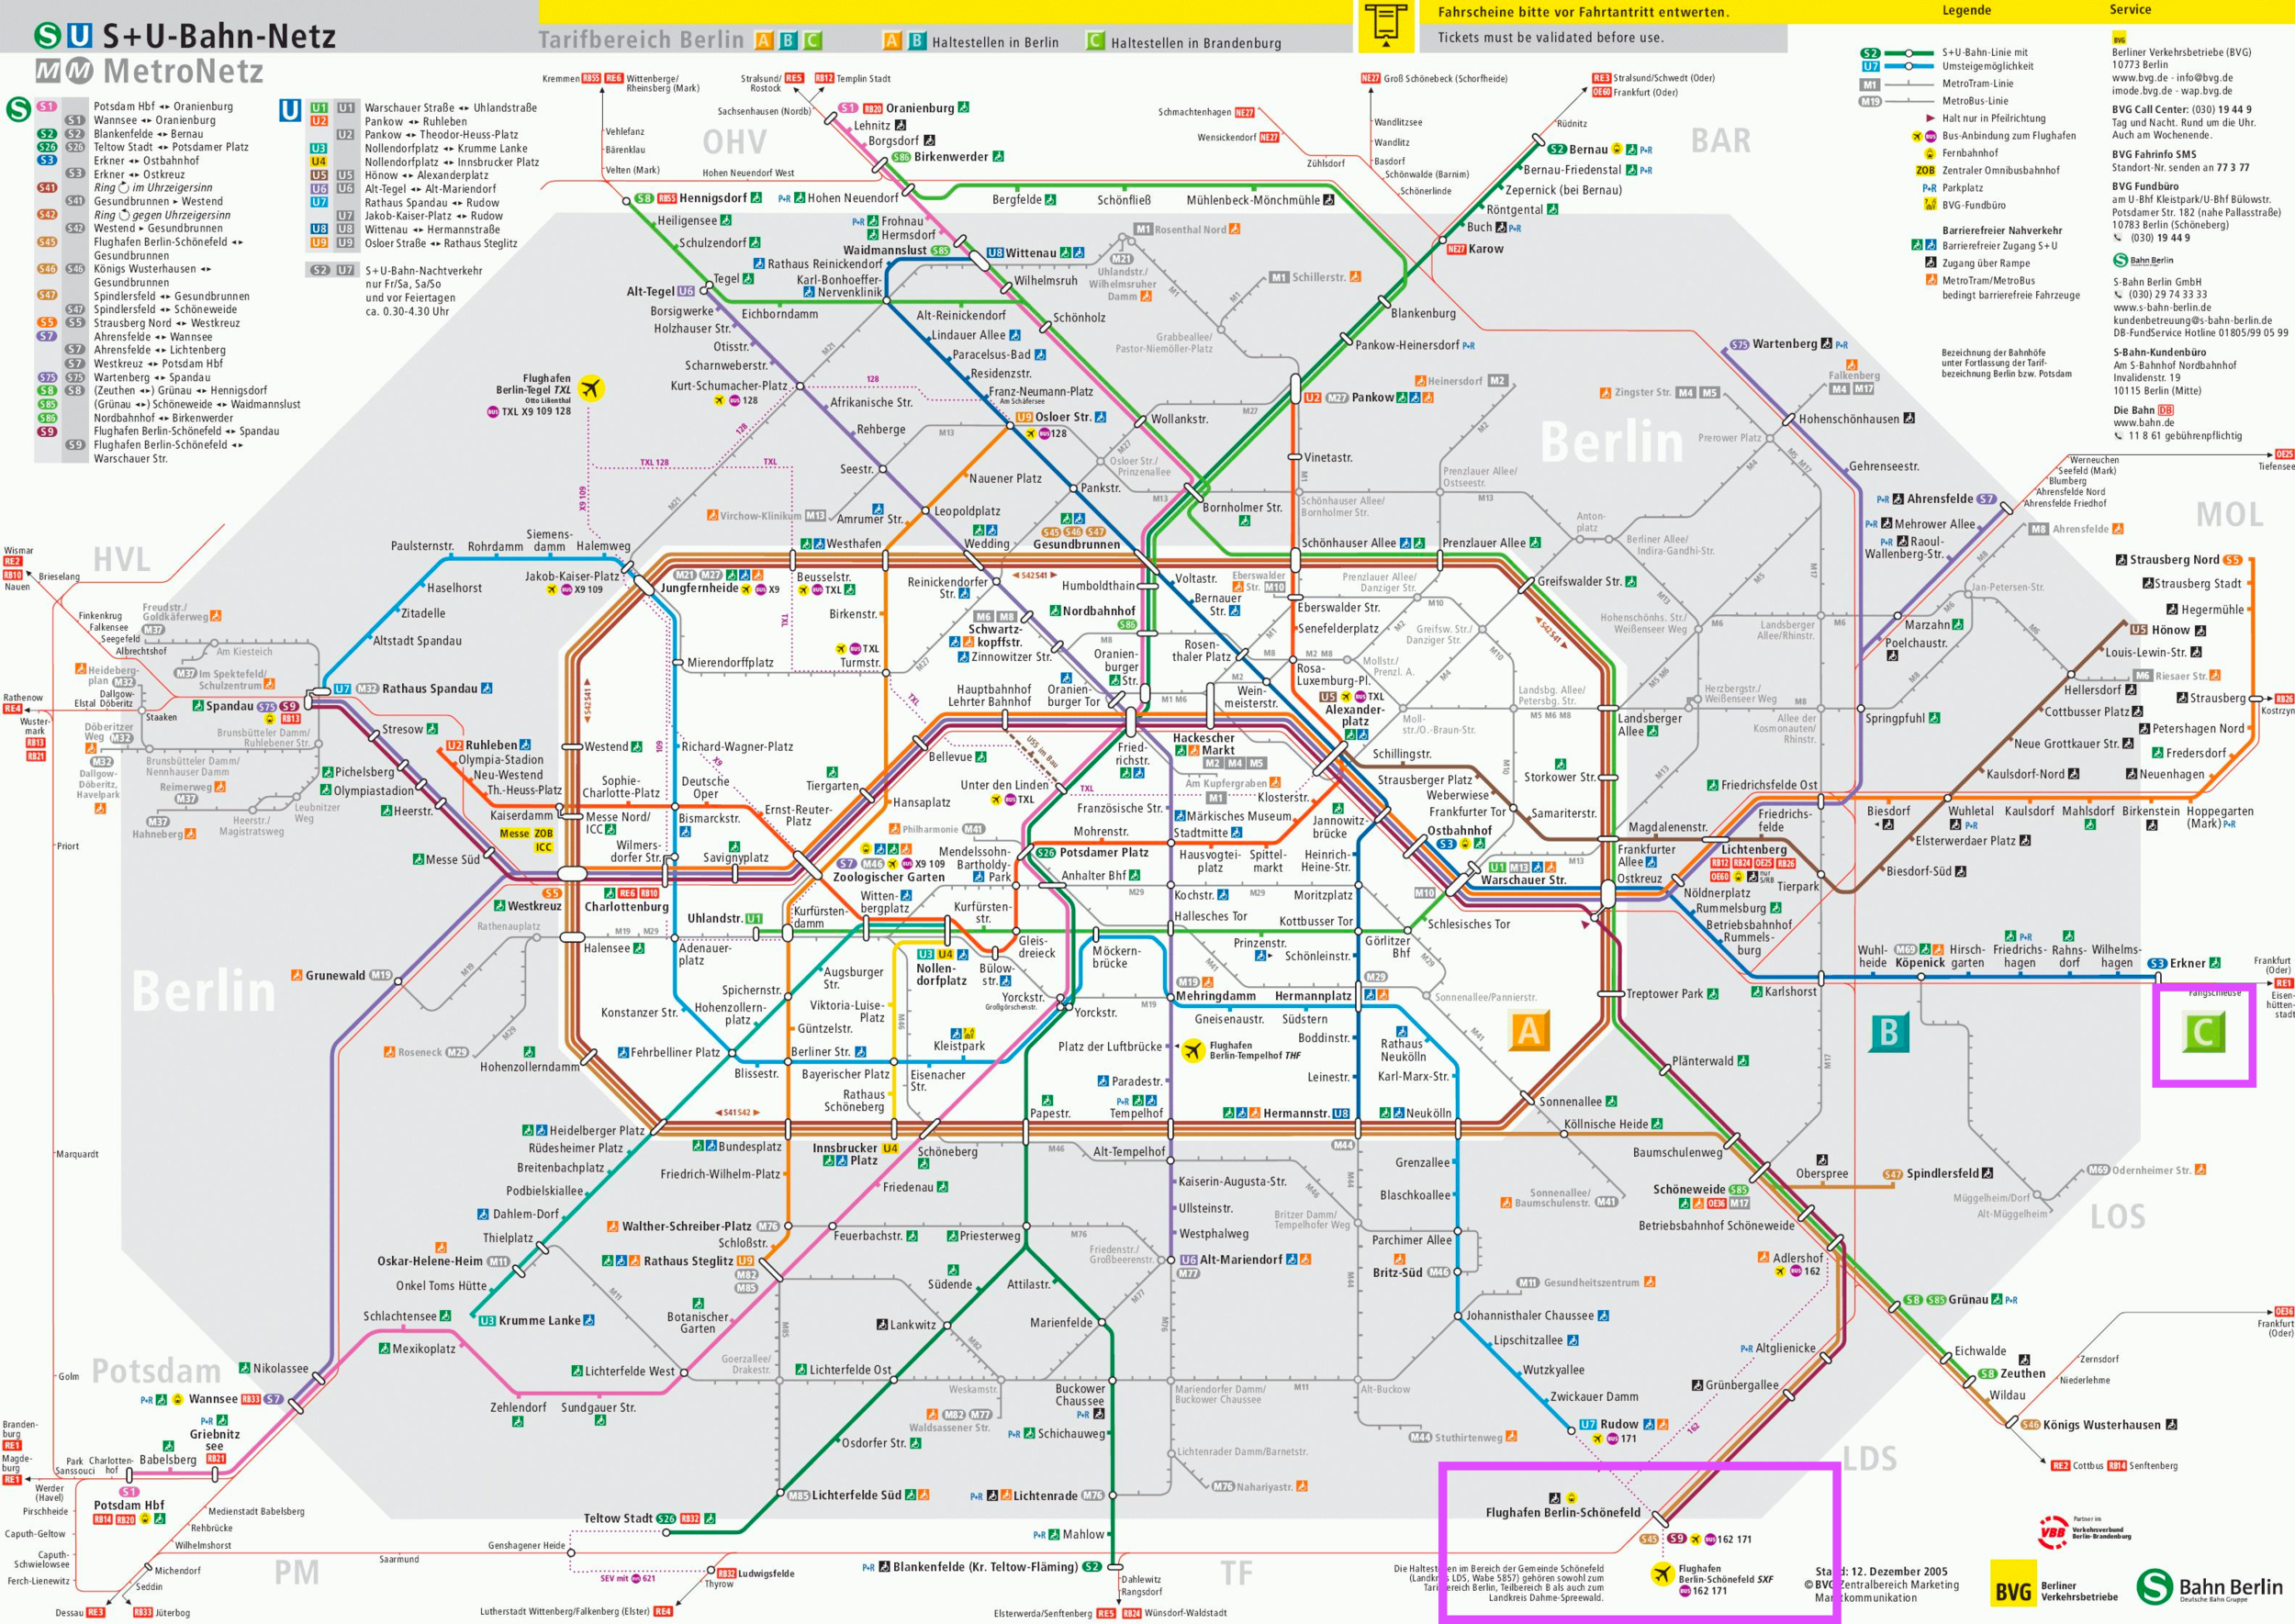 Ubahn map.png